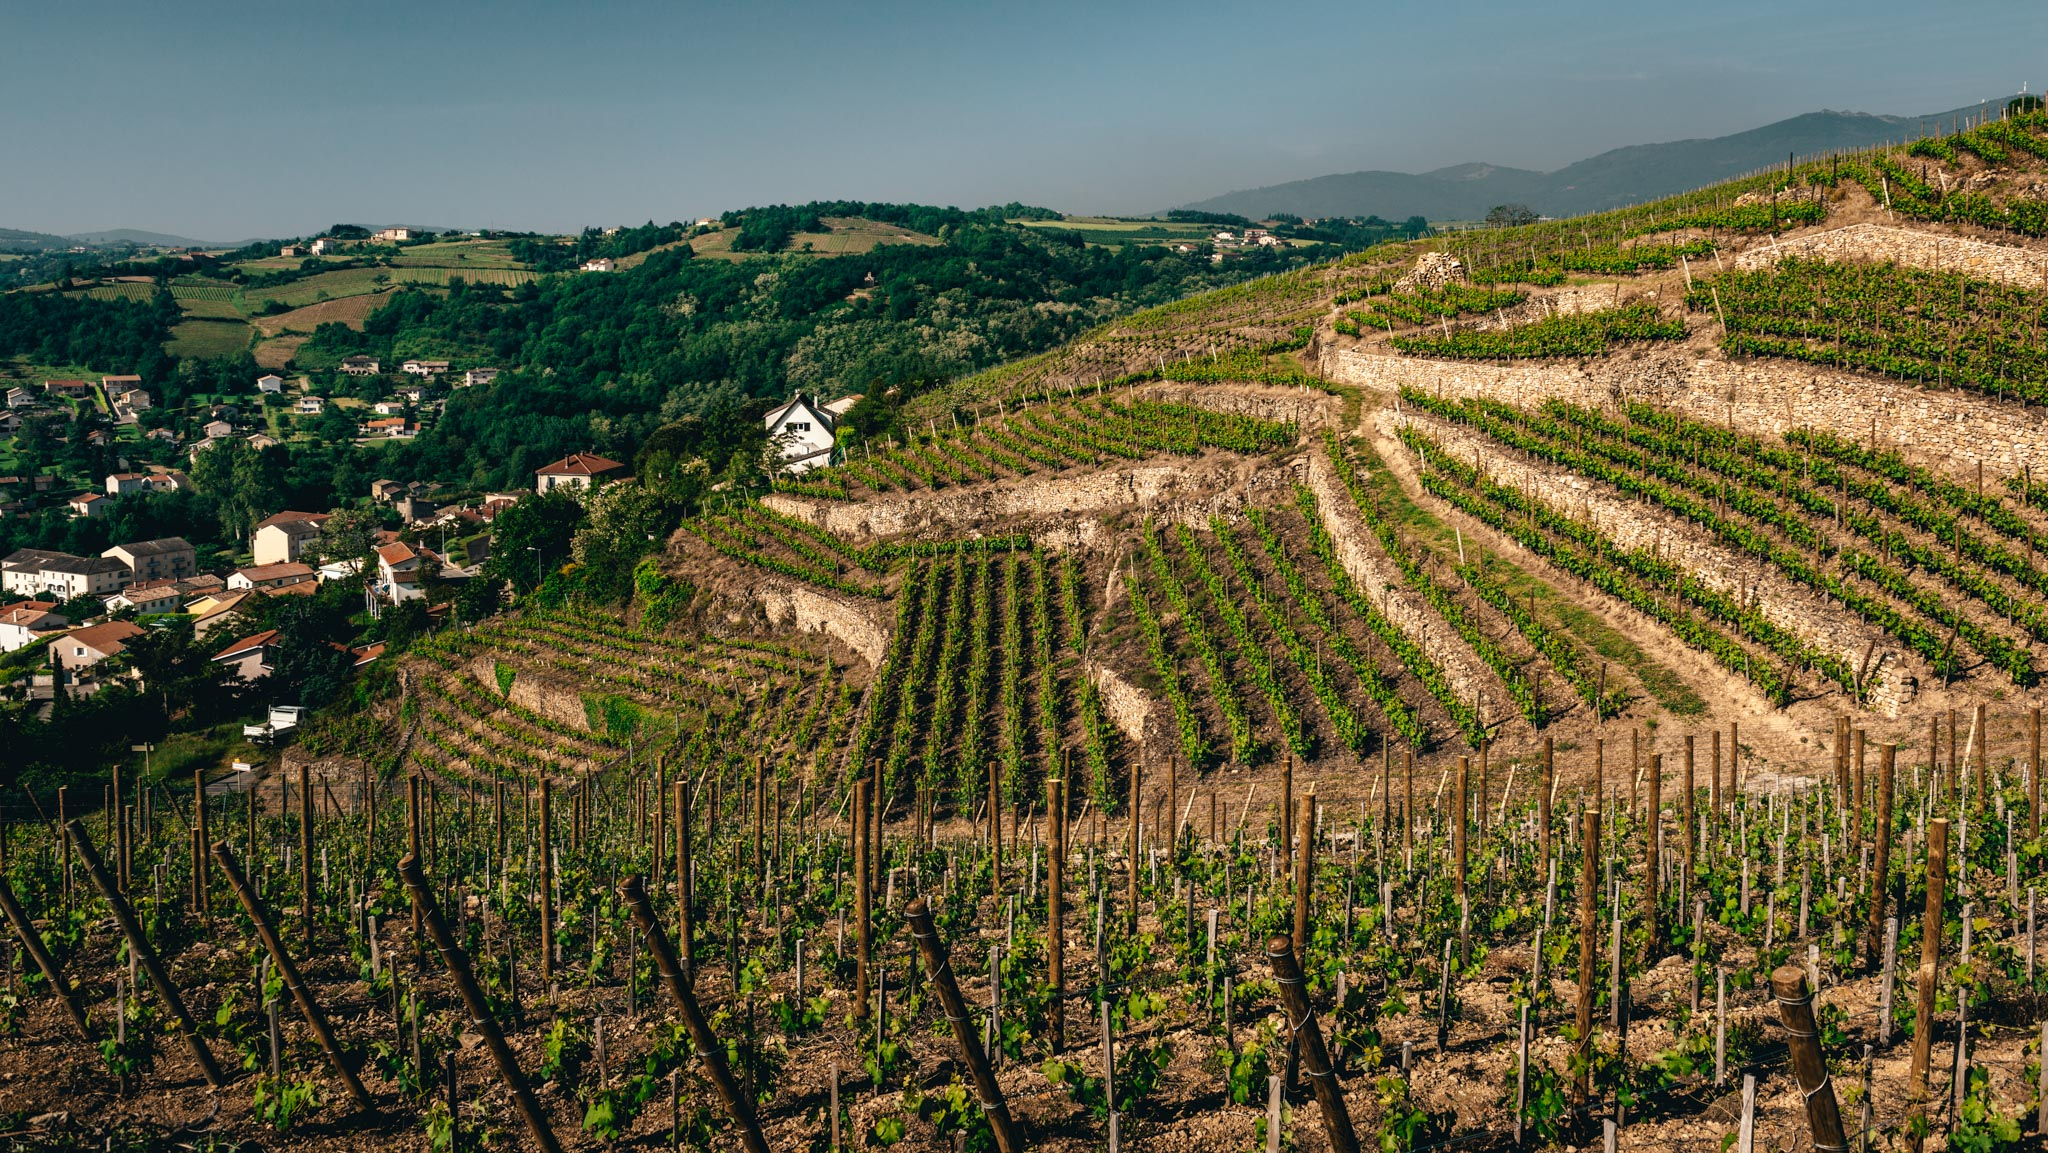 France : Northern Rhone : Condrieu's La Cote vineyard in Chavanay